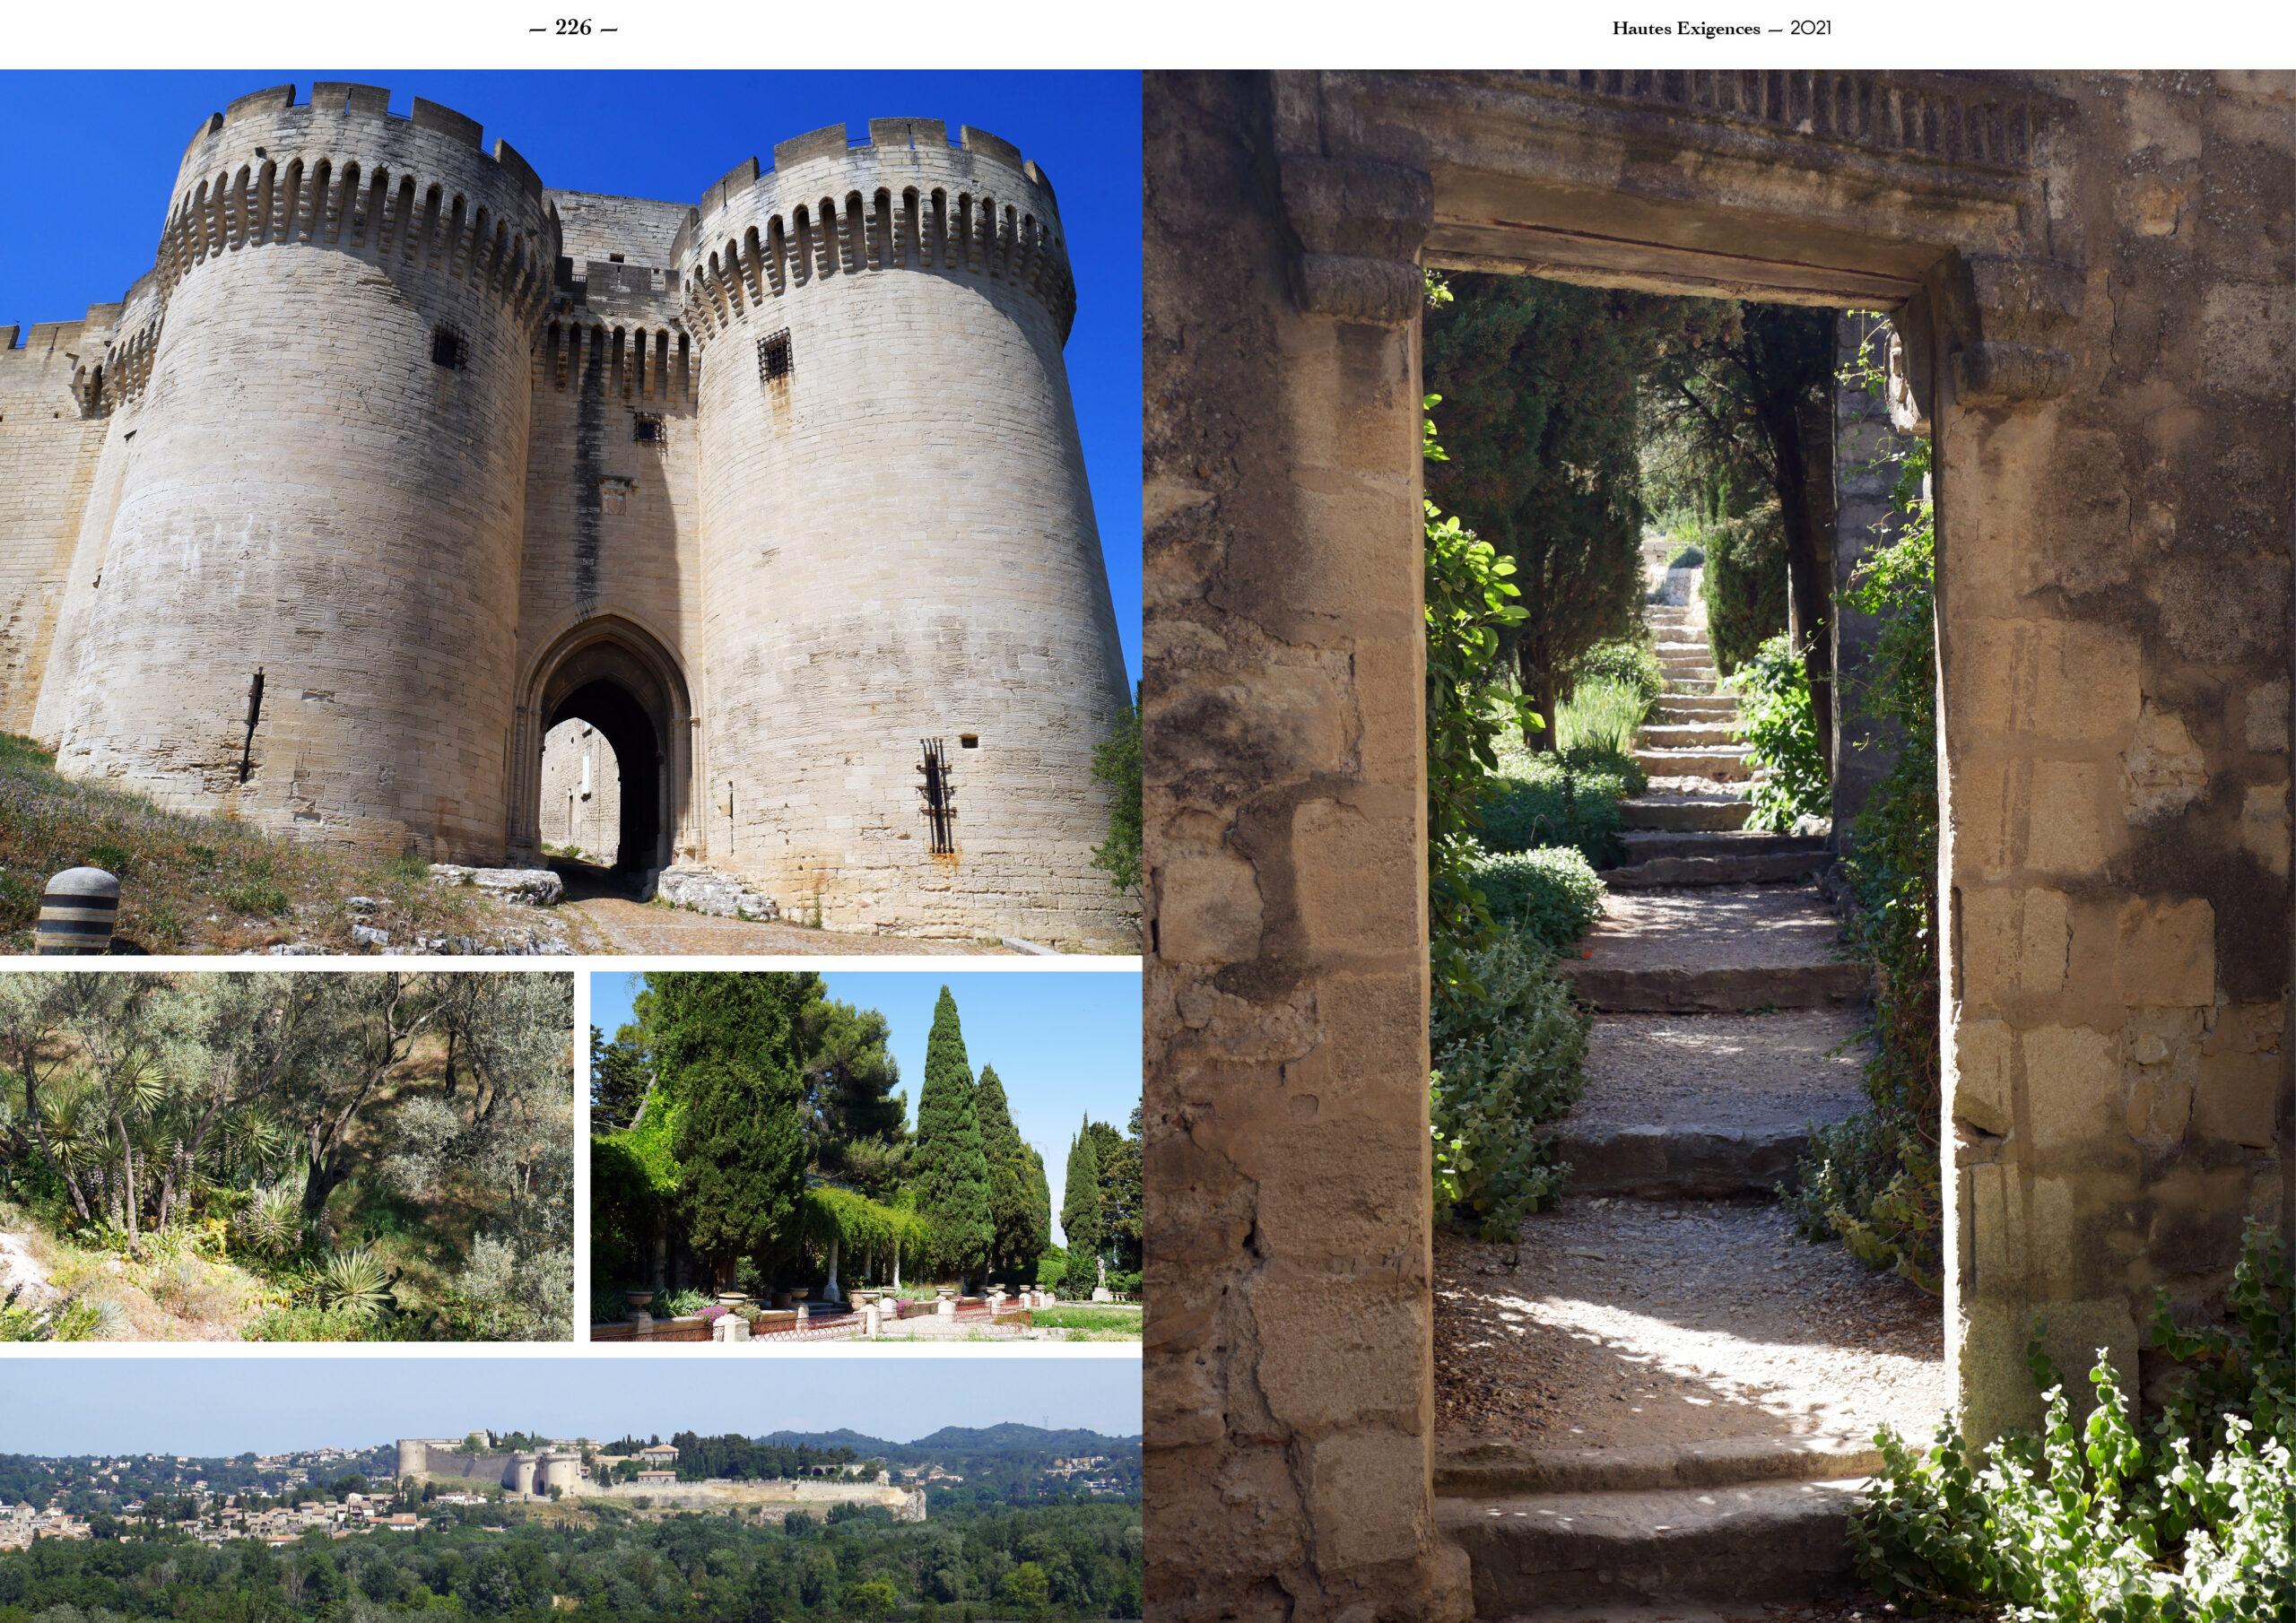 Hautes Exigences Magazine Hors Serie 2021 page 224-225